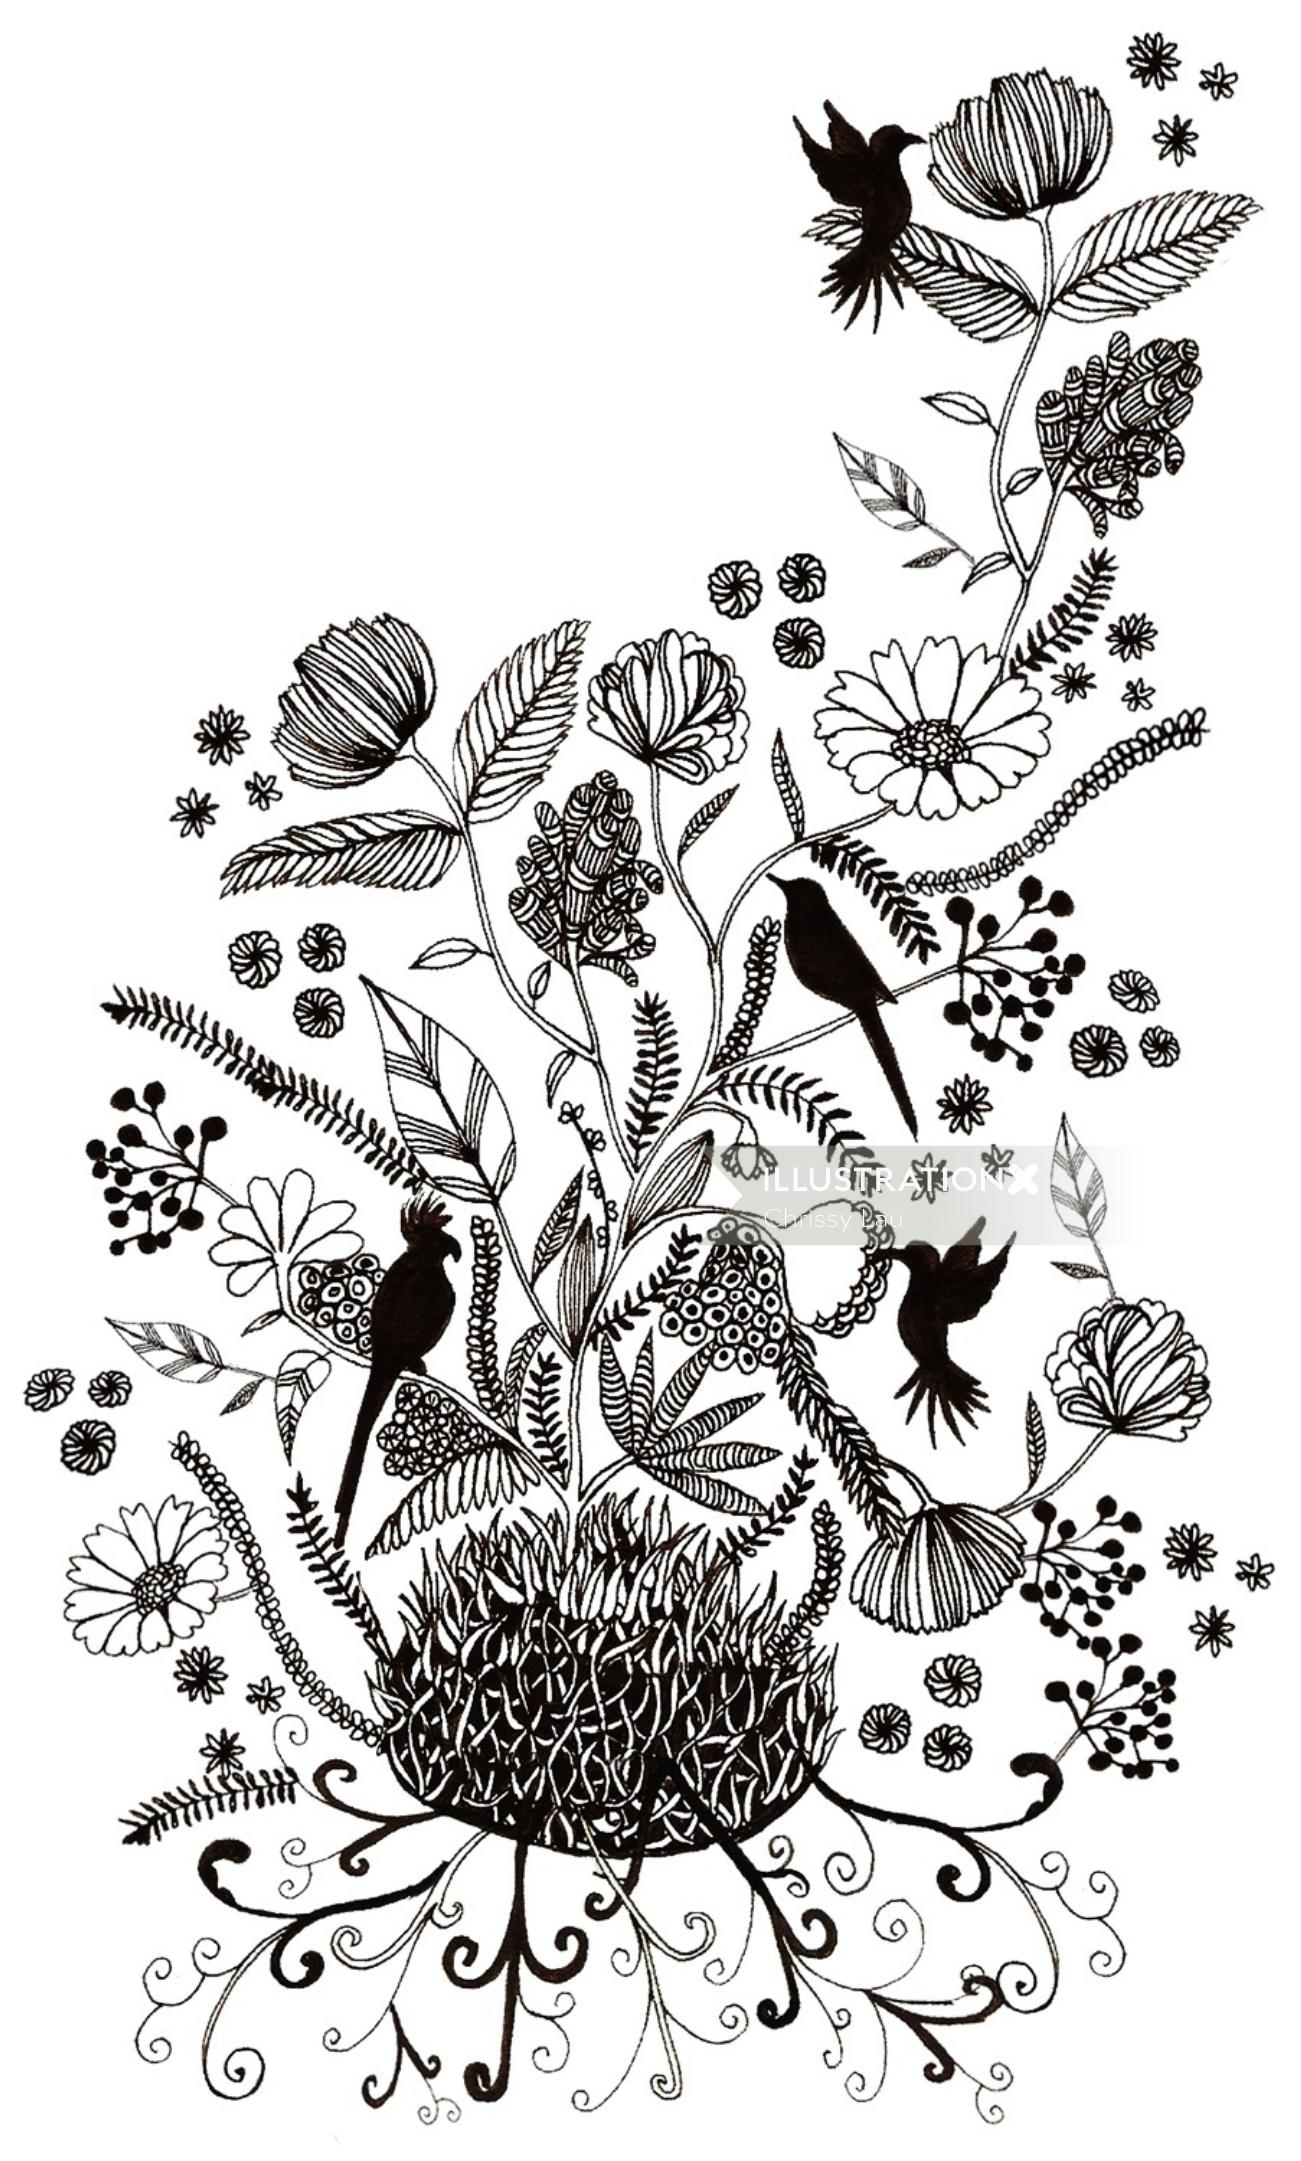 Black and white art of nature hand